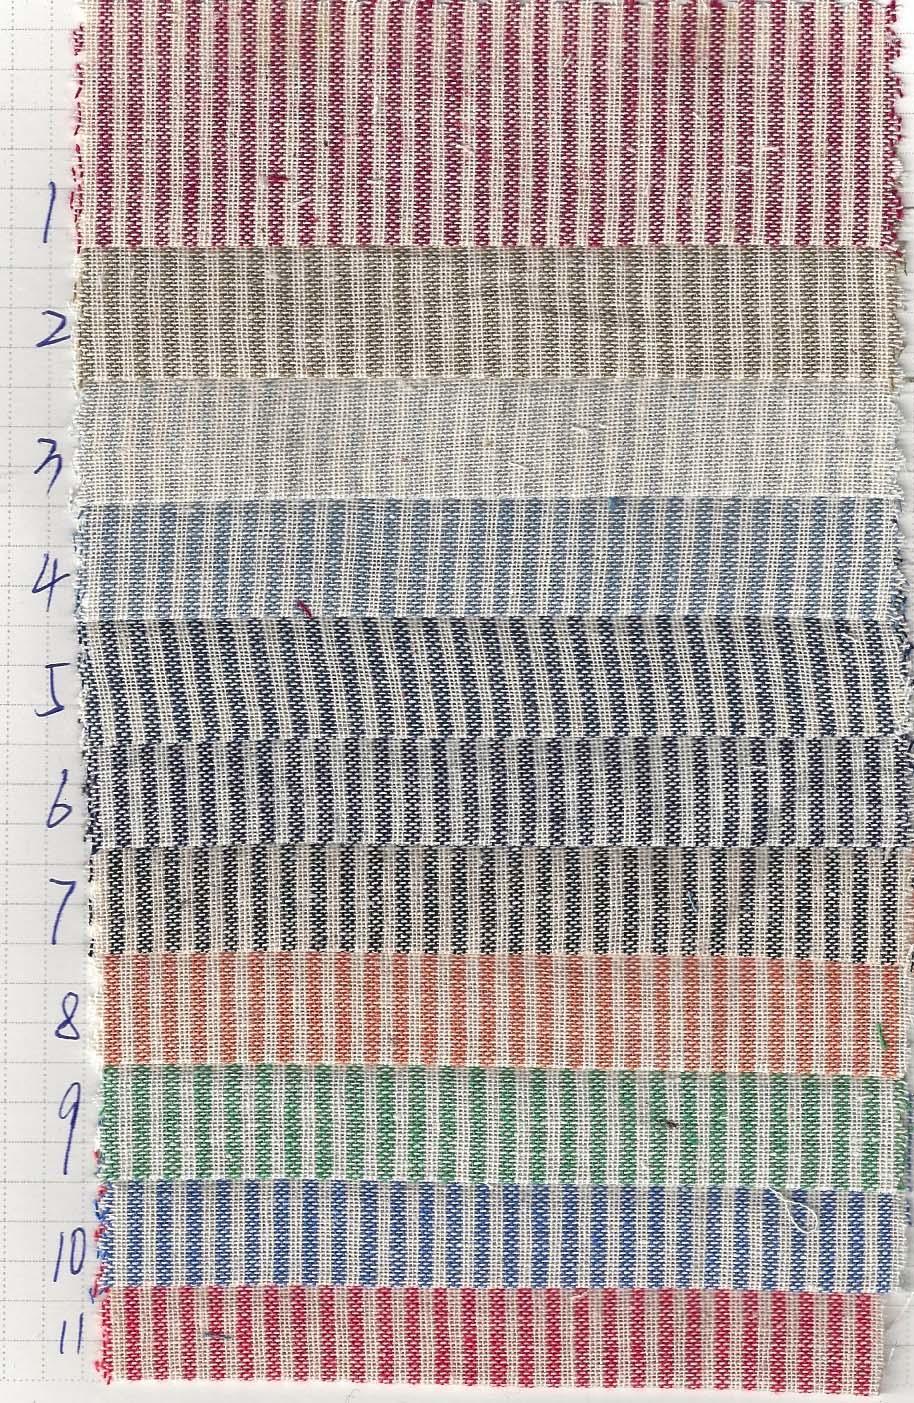 Sheng Ye Textile S424.jpg